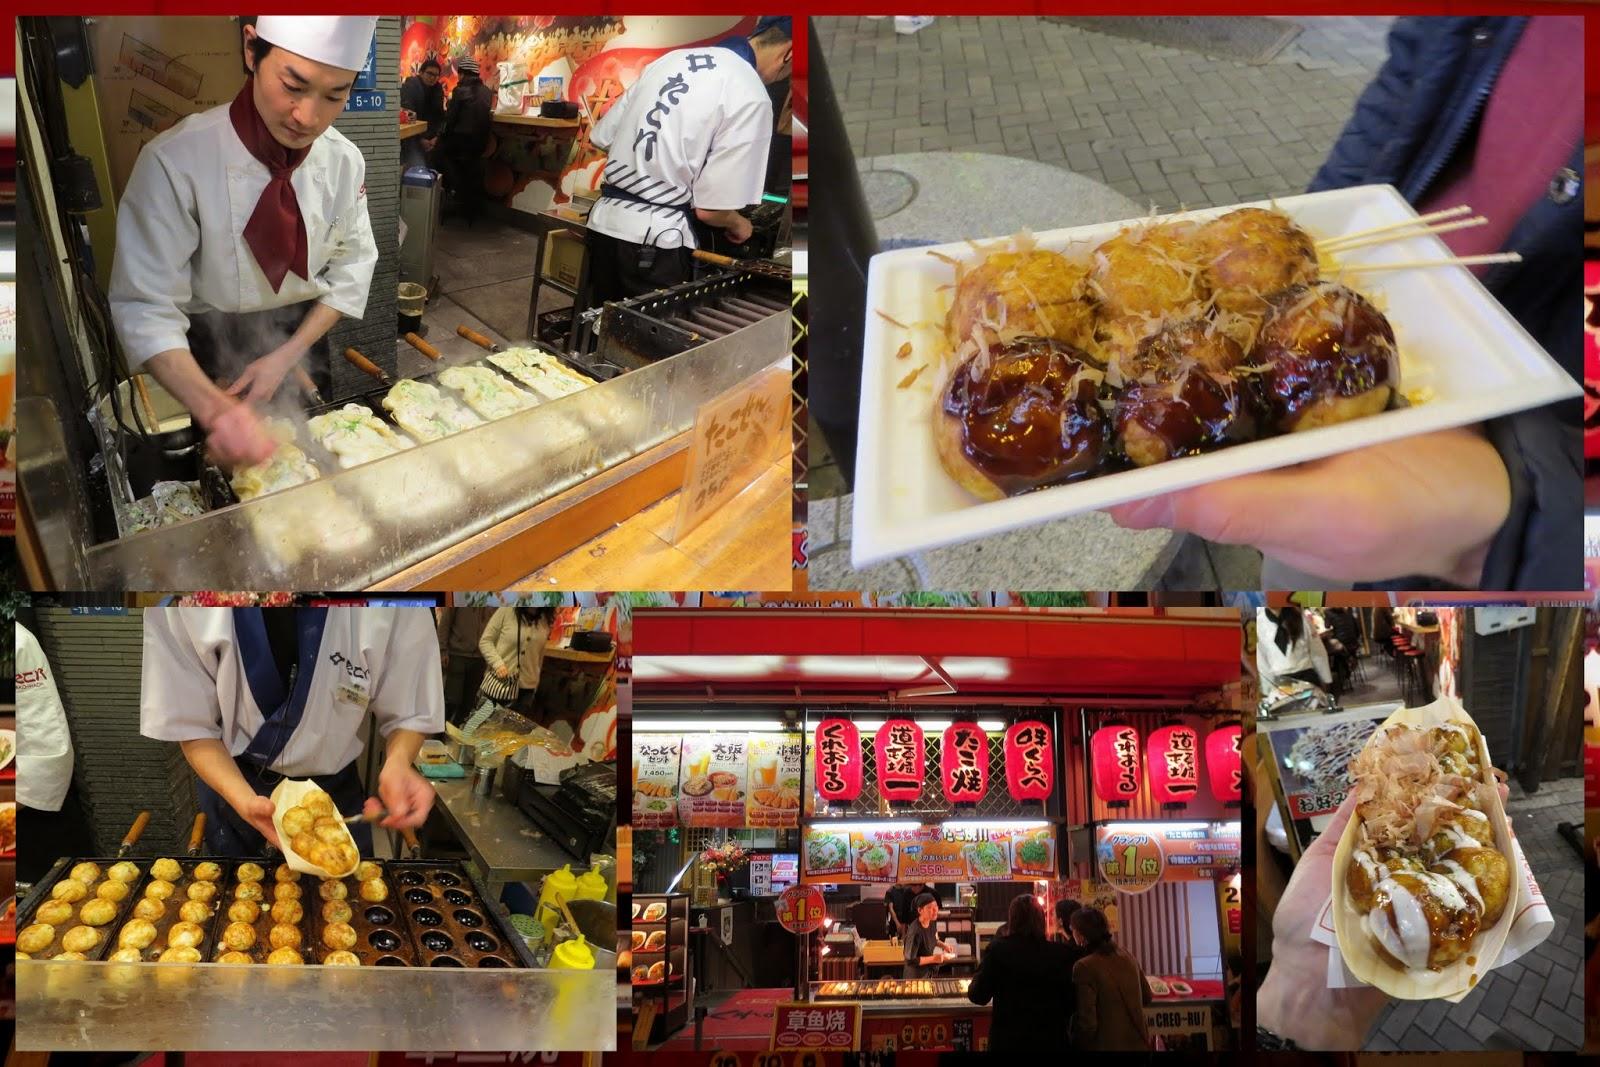 Takoyaki - Octopus Dumplings